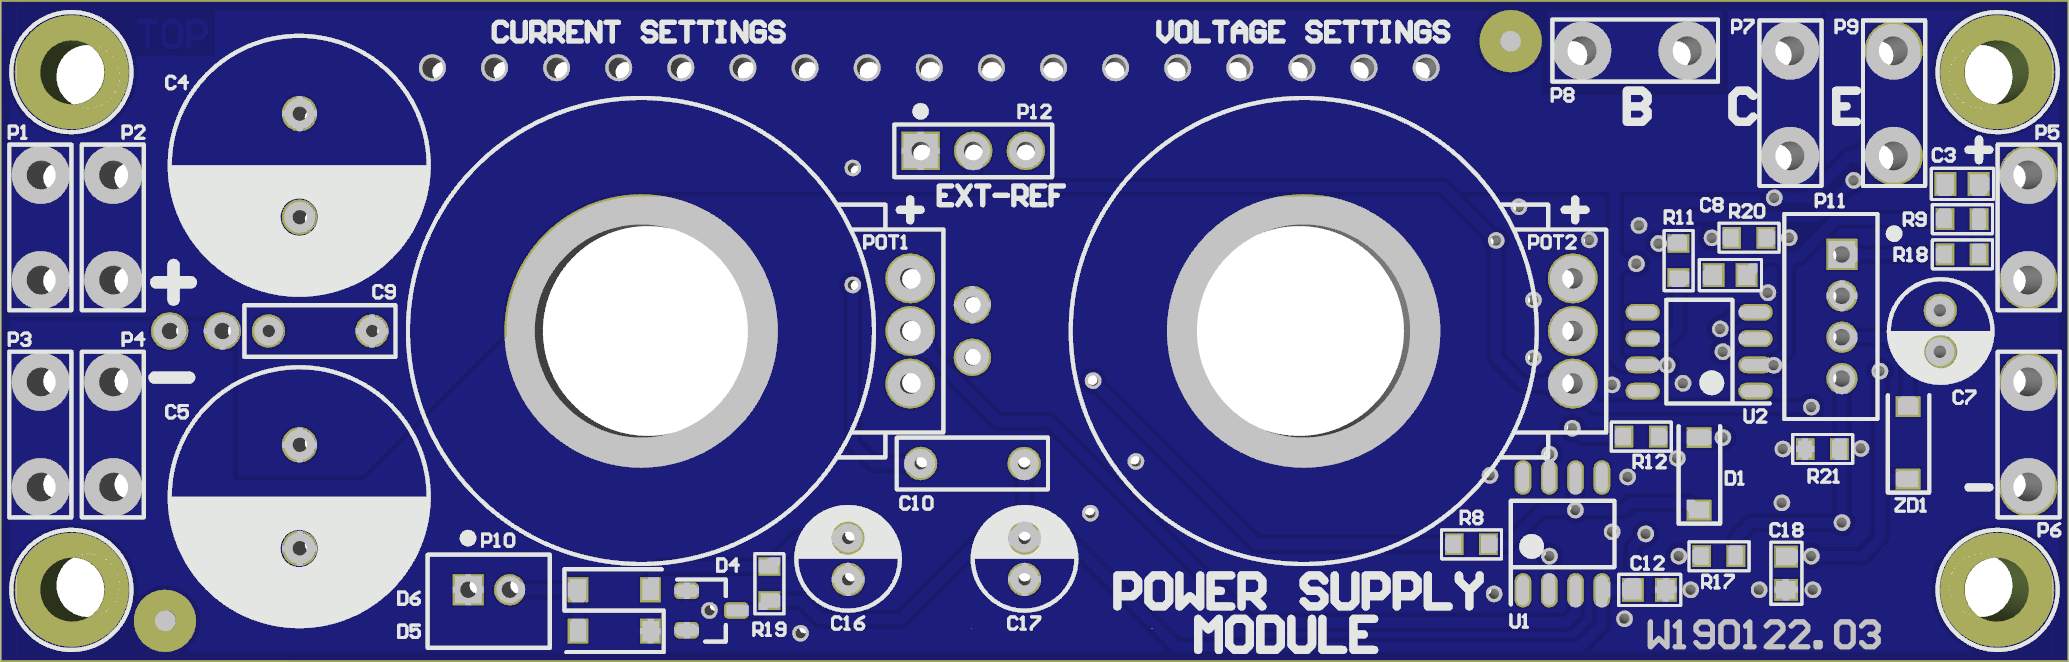 W190122.03 PCB Screenshot TOP